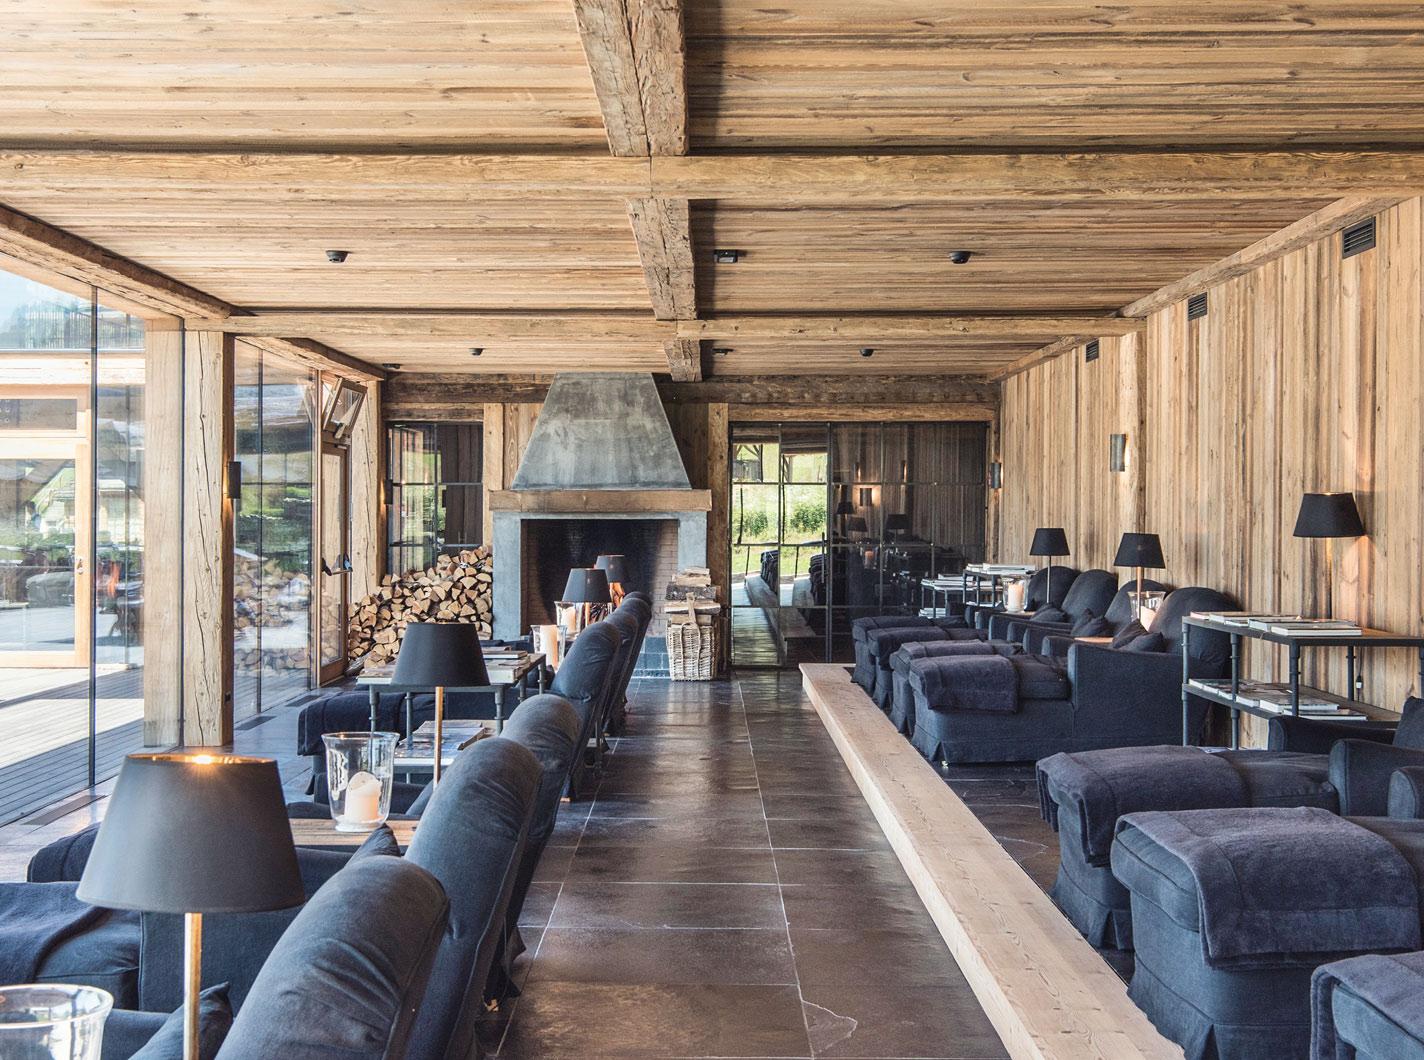 san luis retreat hotel south tyrol pretty hotels. Black Bedroom Furniture Sets. Home Design Ideas